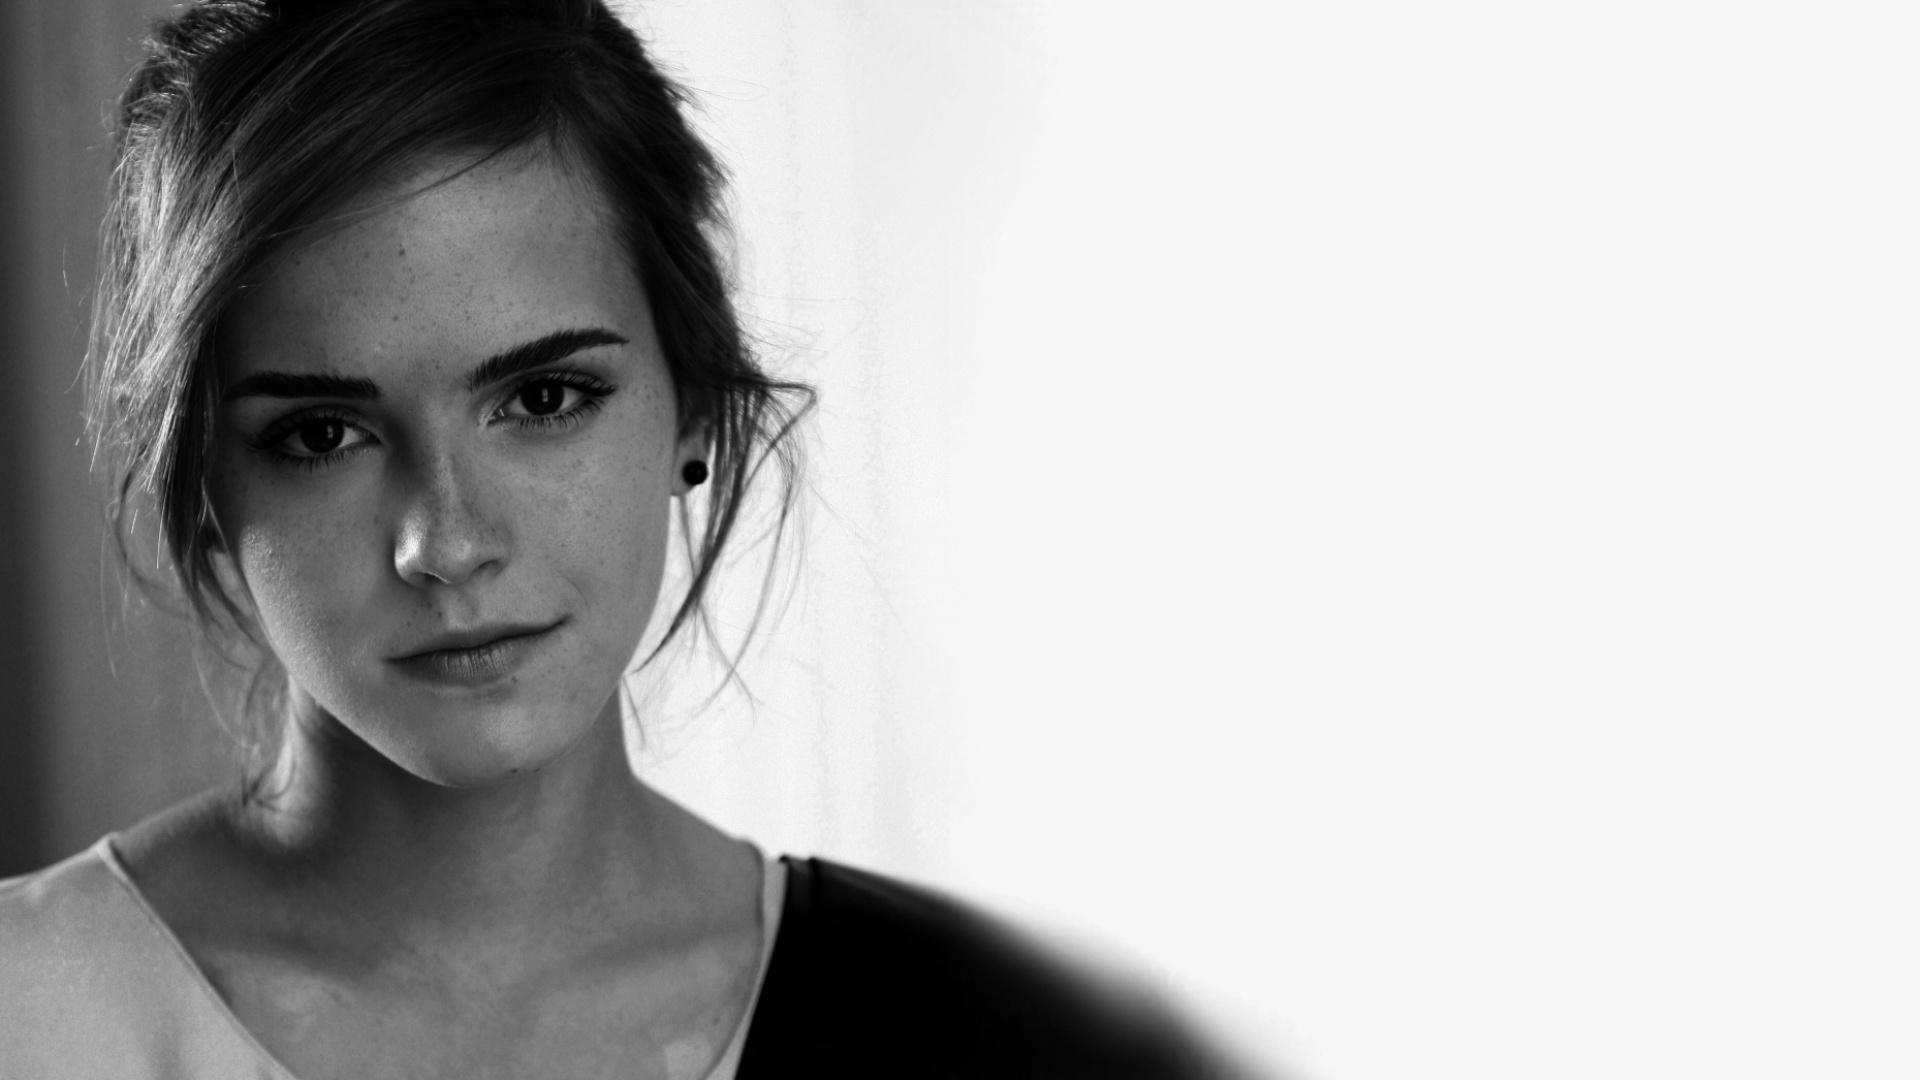 Emma Watson Iphone Wallpaper 25659 Hd Wallpapers Background 1920x1080